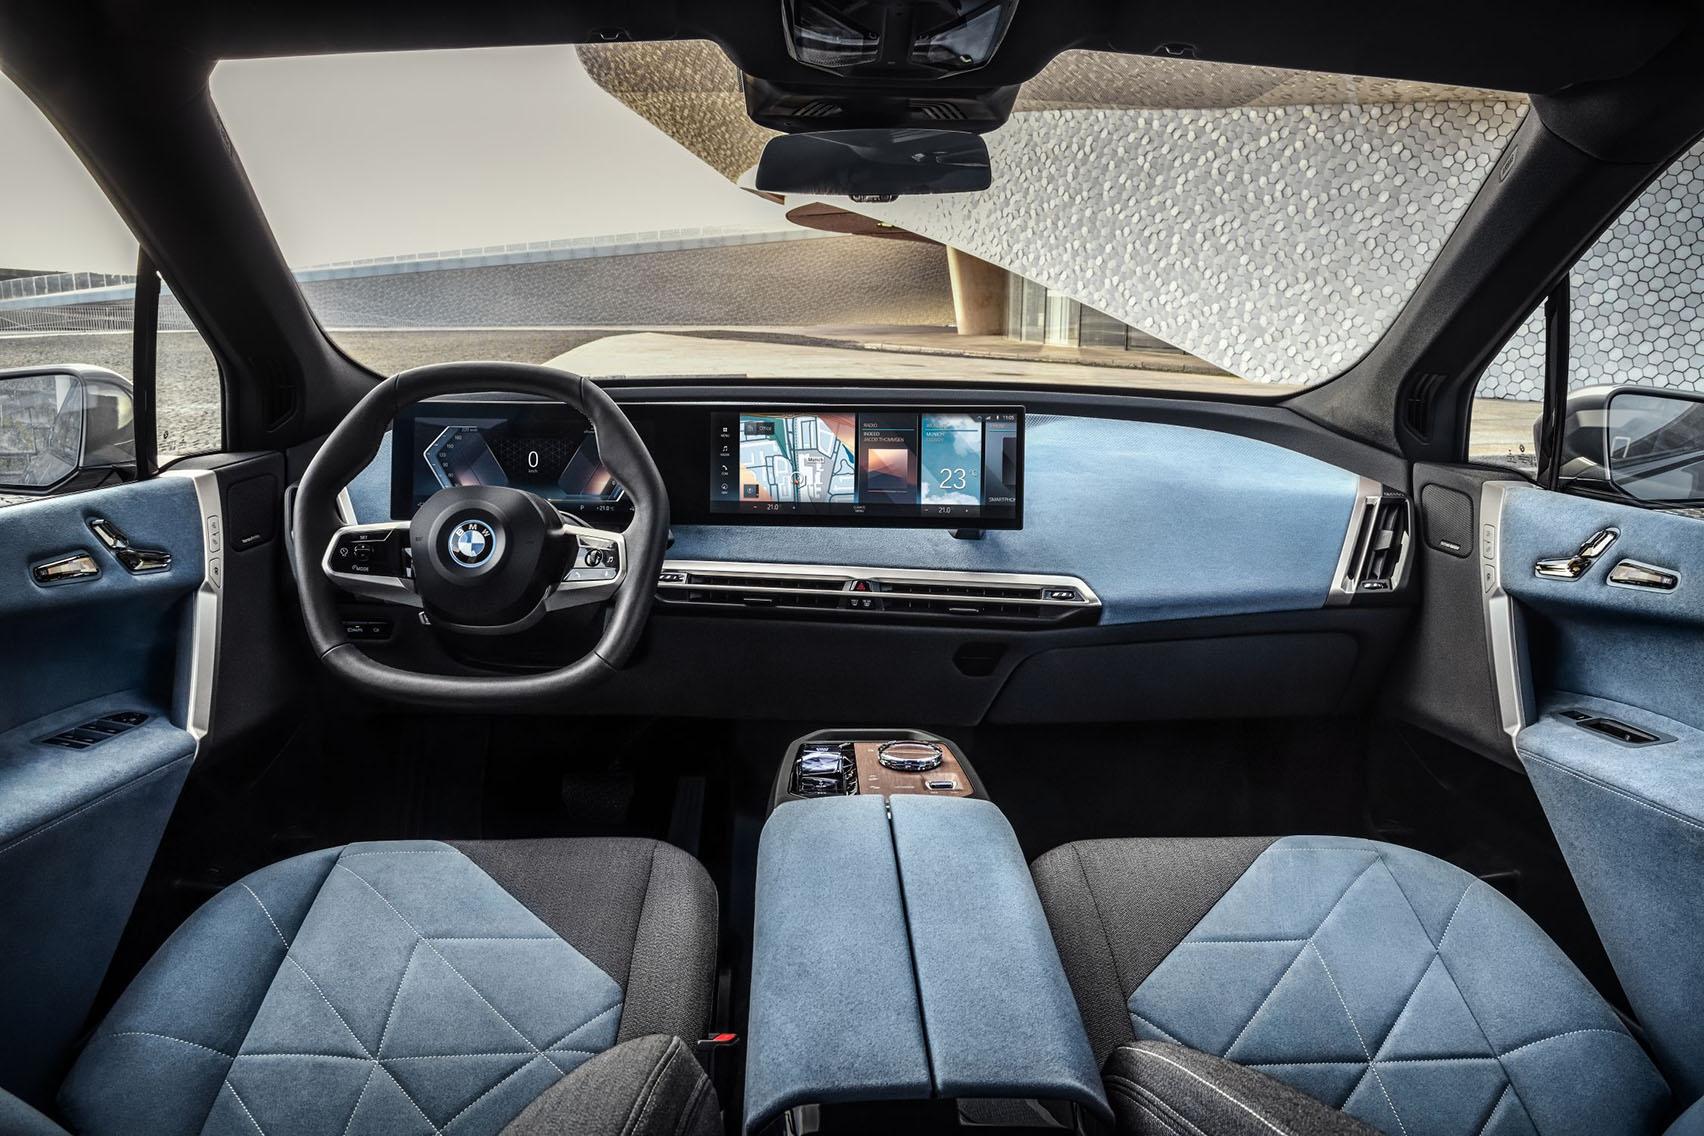 Hexagonal steering wheel